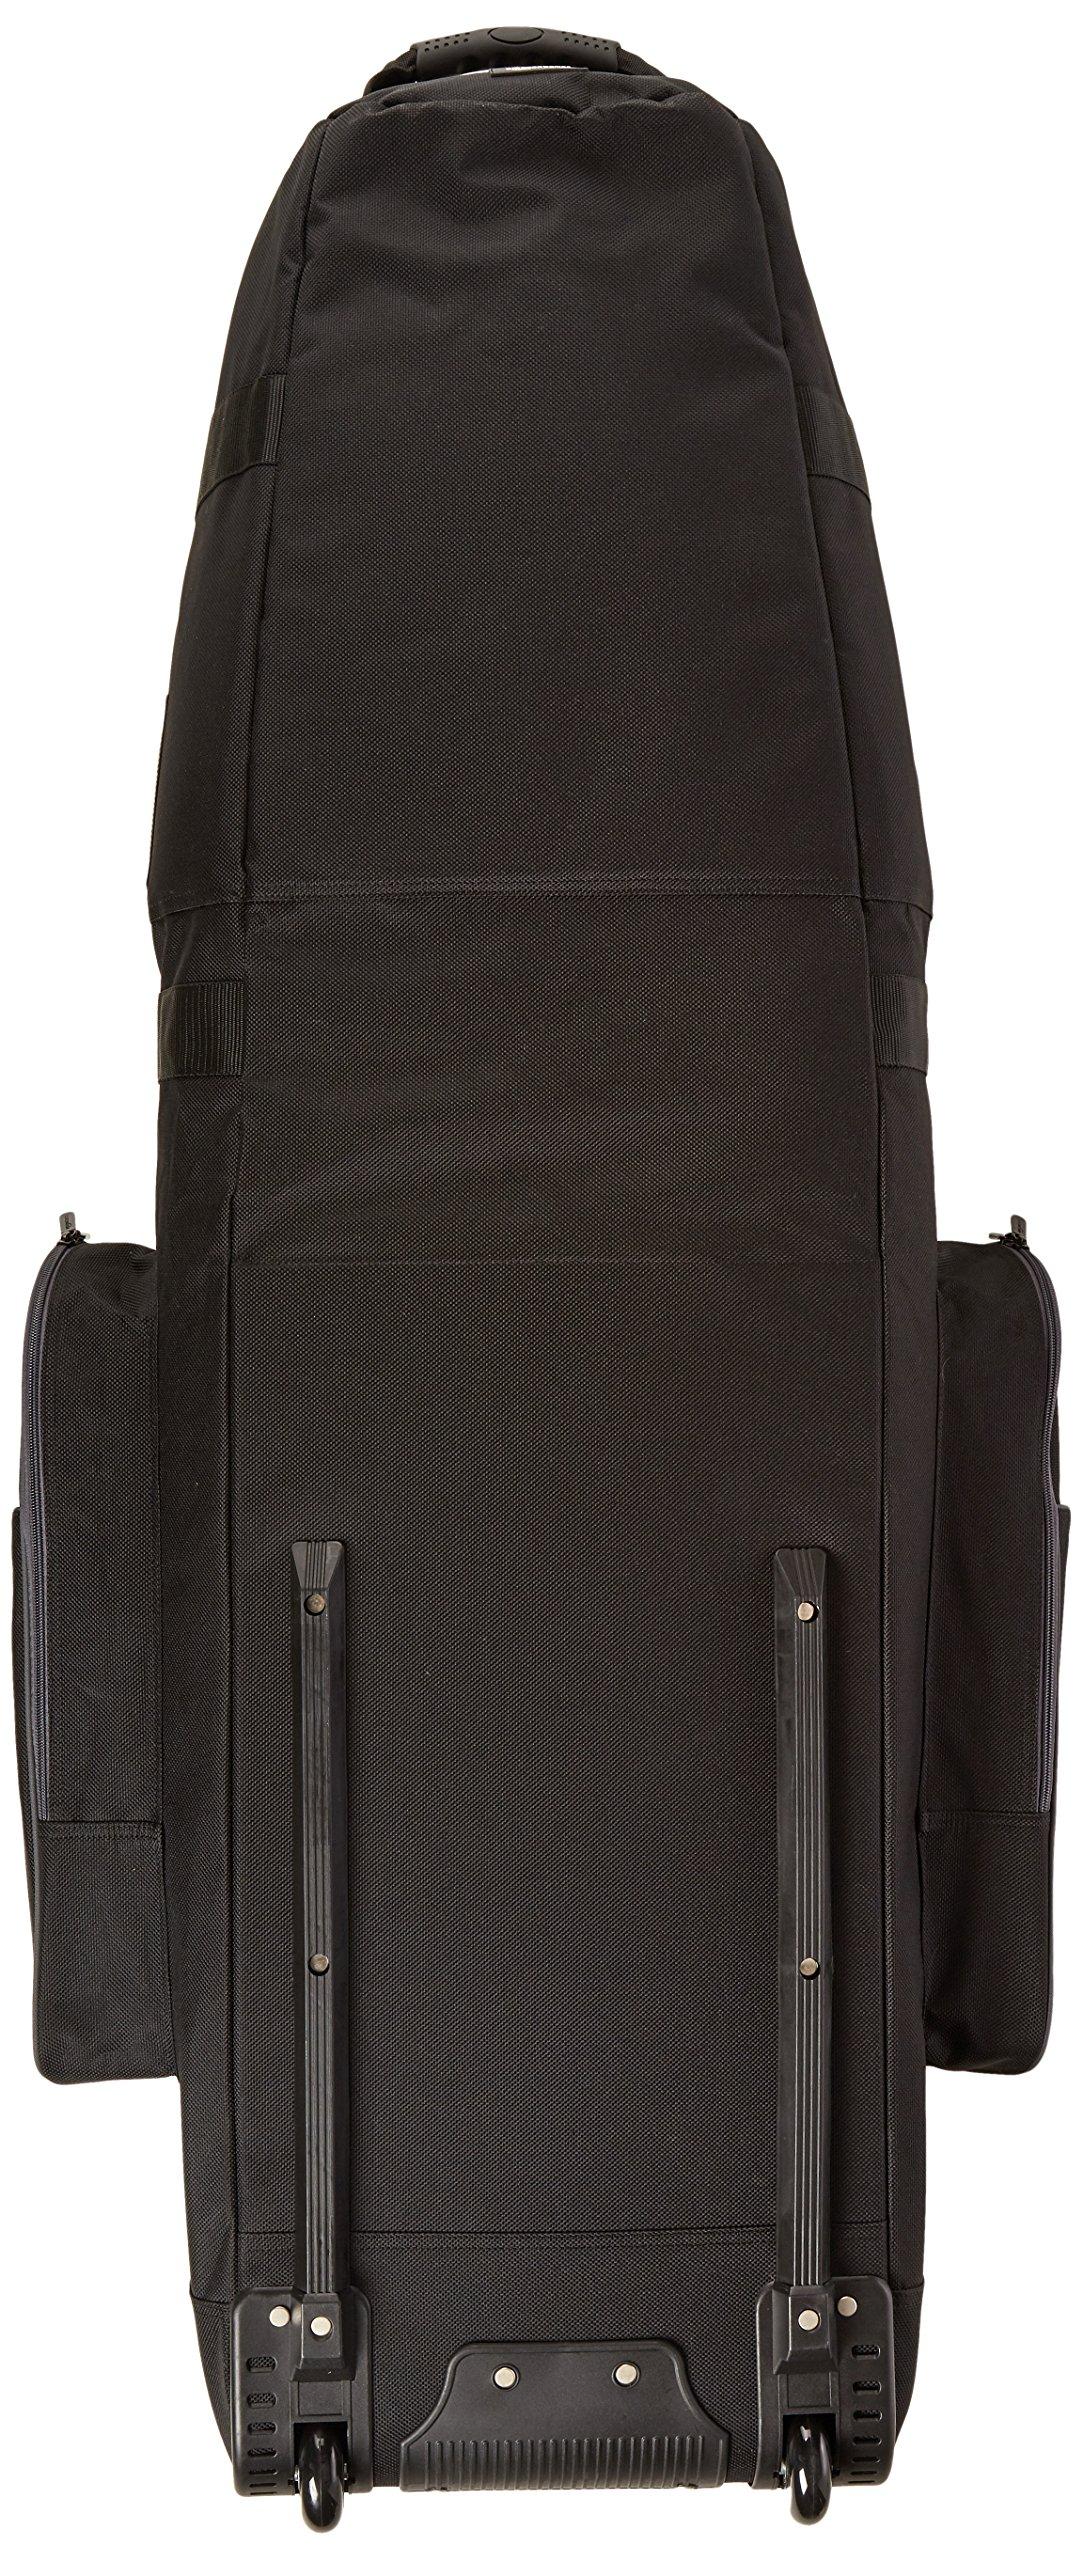 Amazonbasics Soft Sided Golf Travel Bag Exercisen